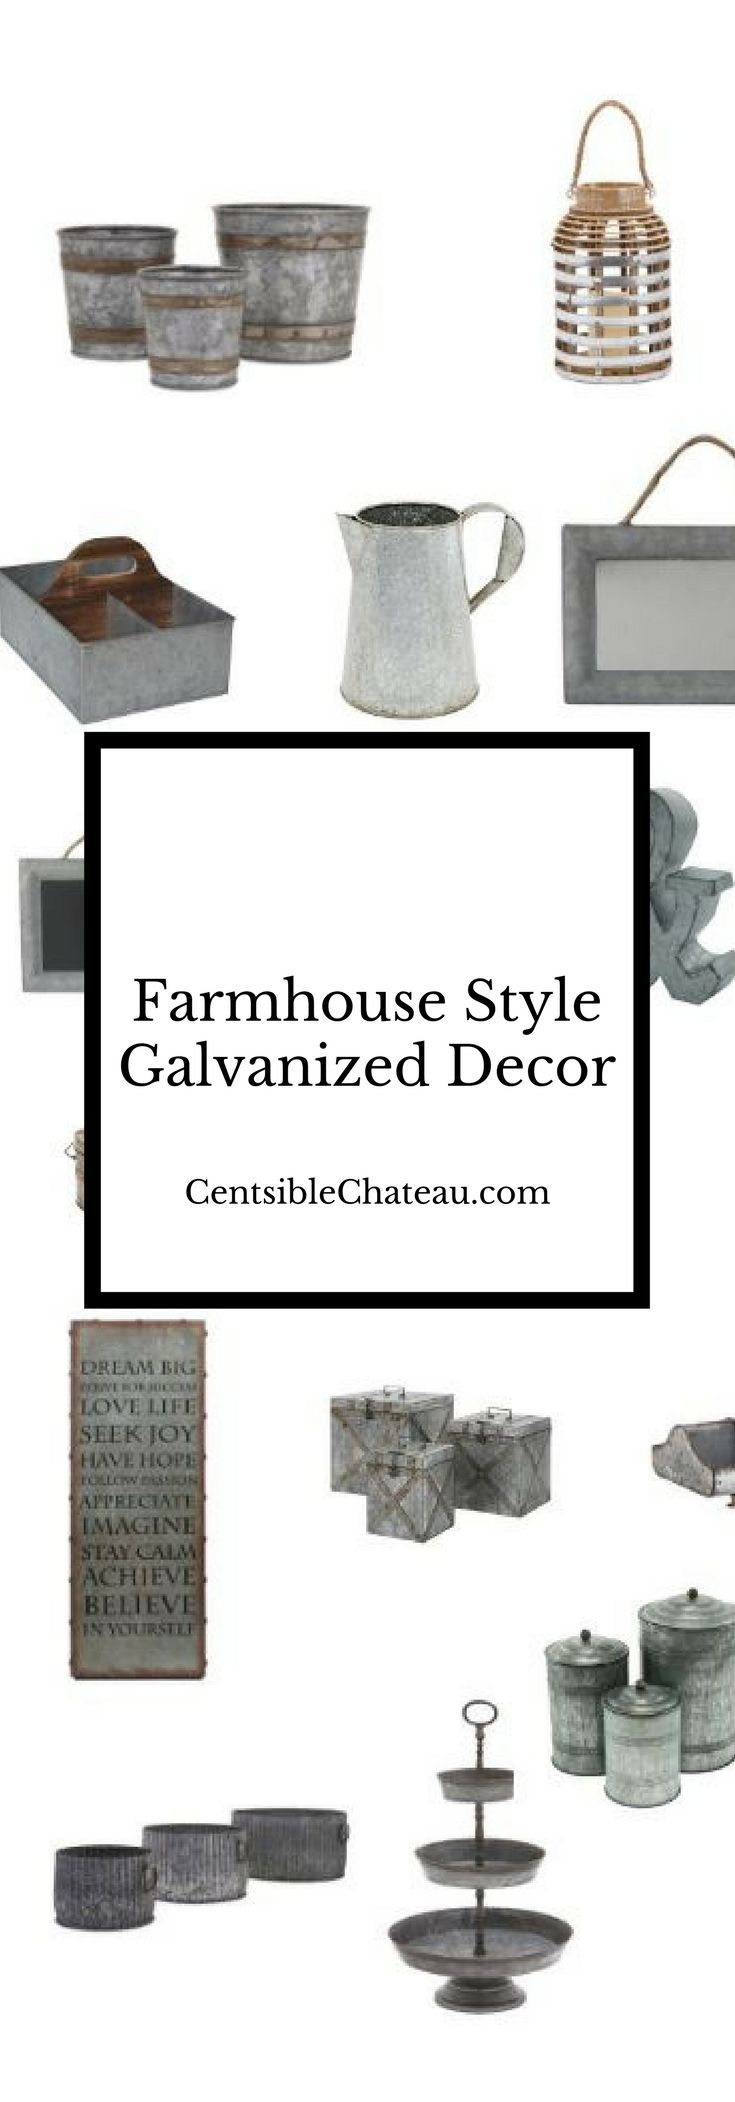 17 best ideas about joanna gaines farmhouse on pinterest. Black Bedroom Furniture Sets. Home Design Ideas